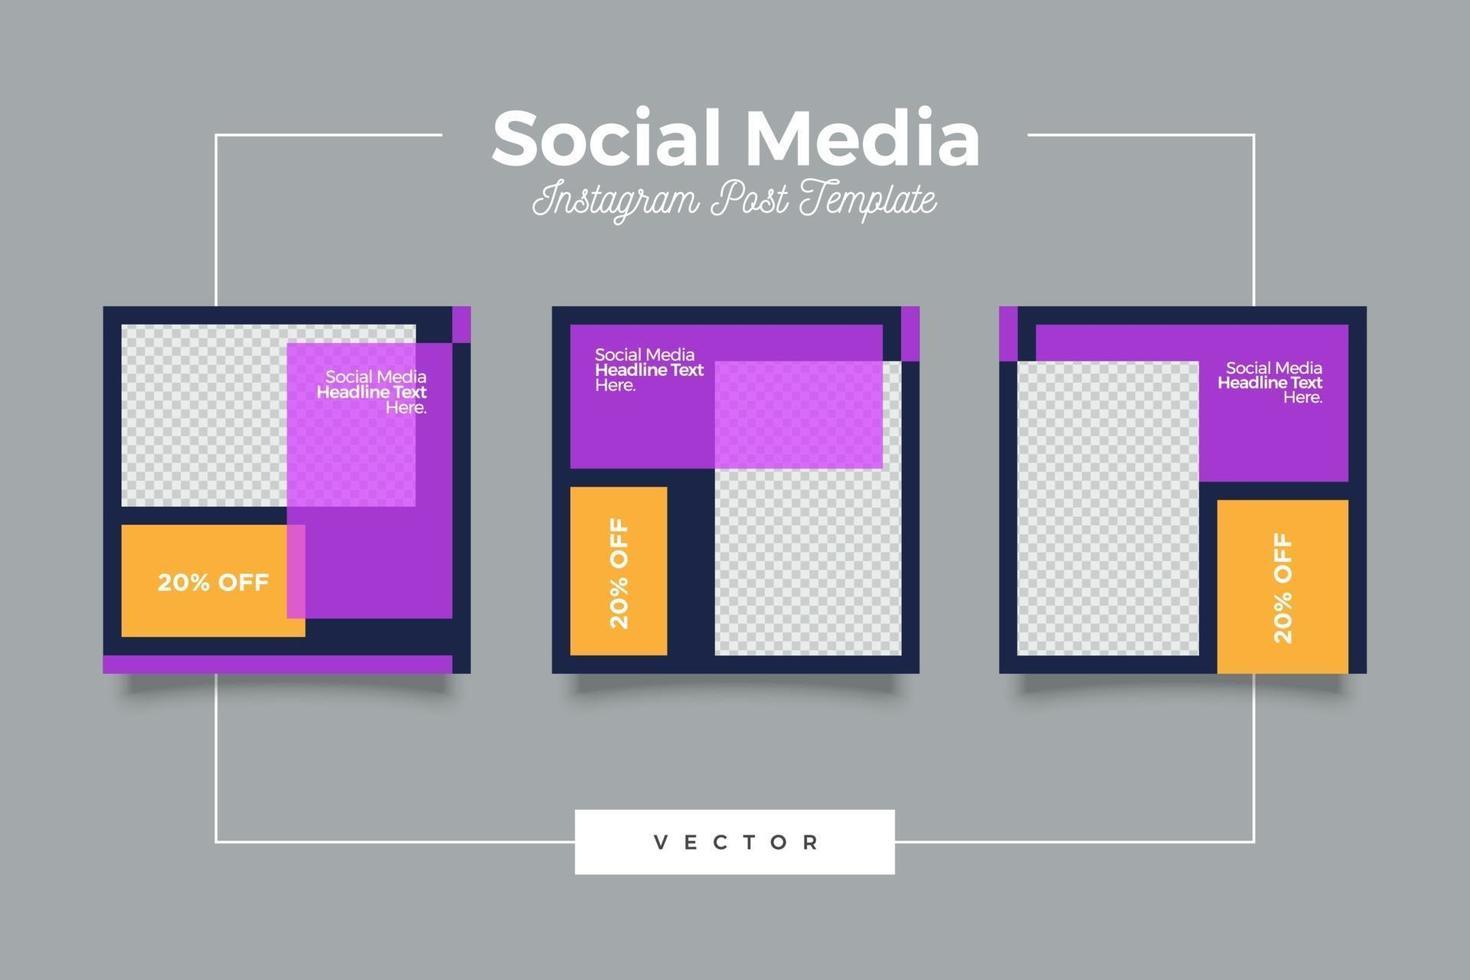 agência de marketing conjunto de pós-banner de mídia social vetor